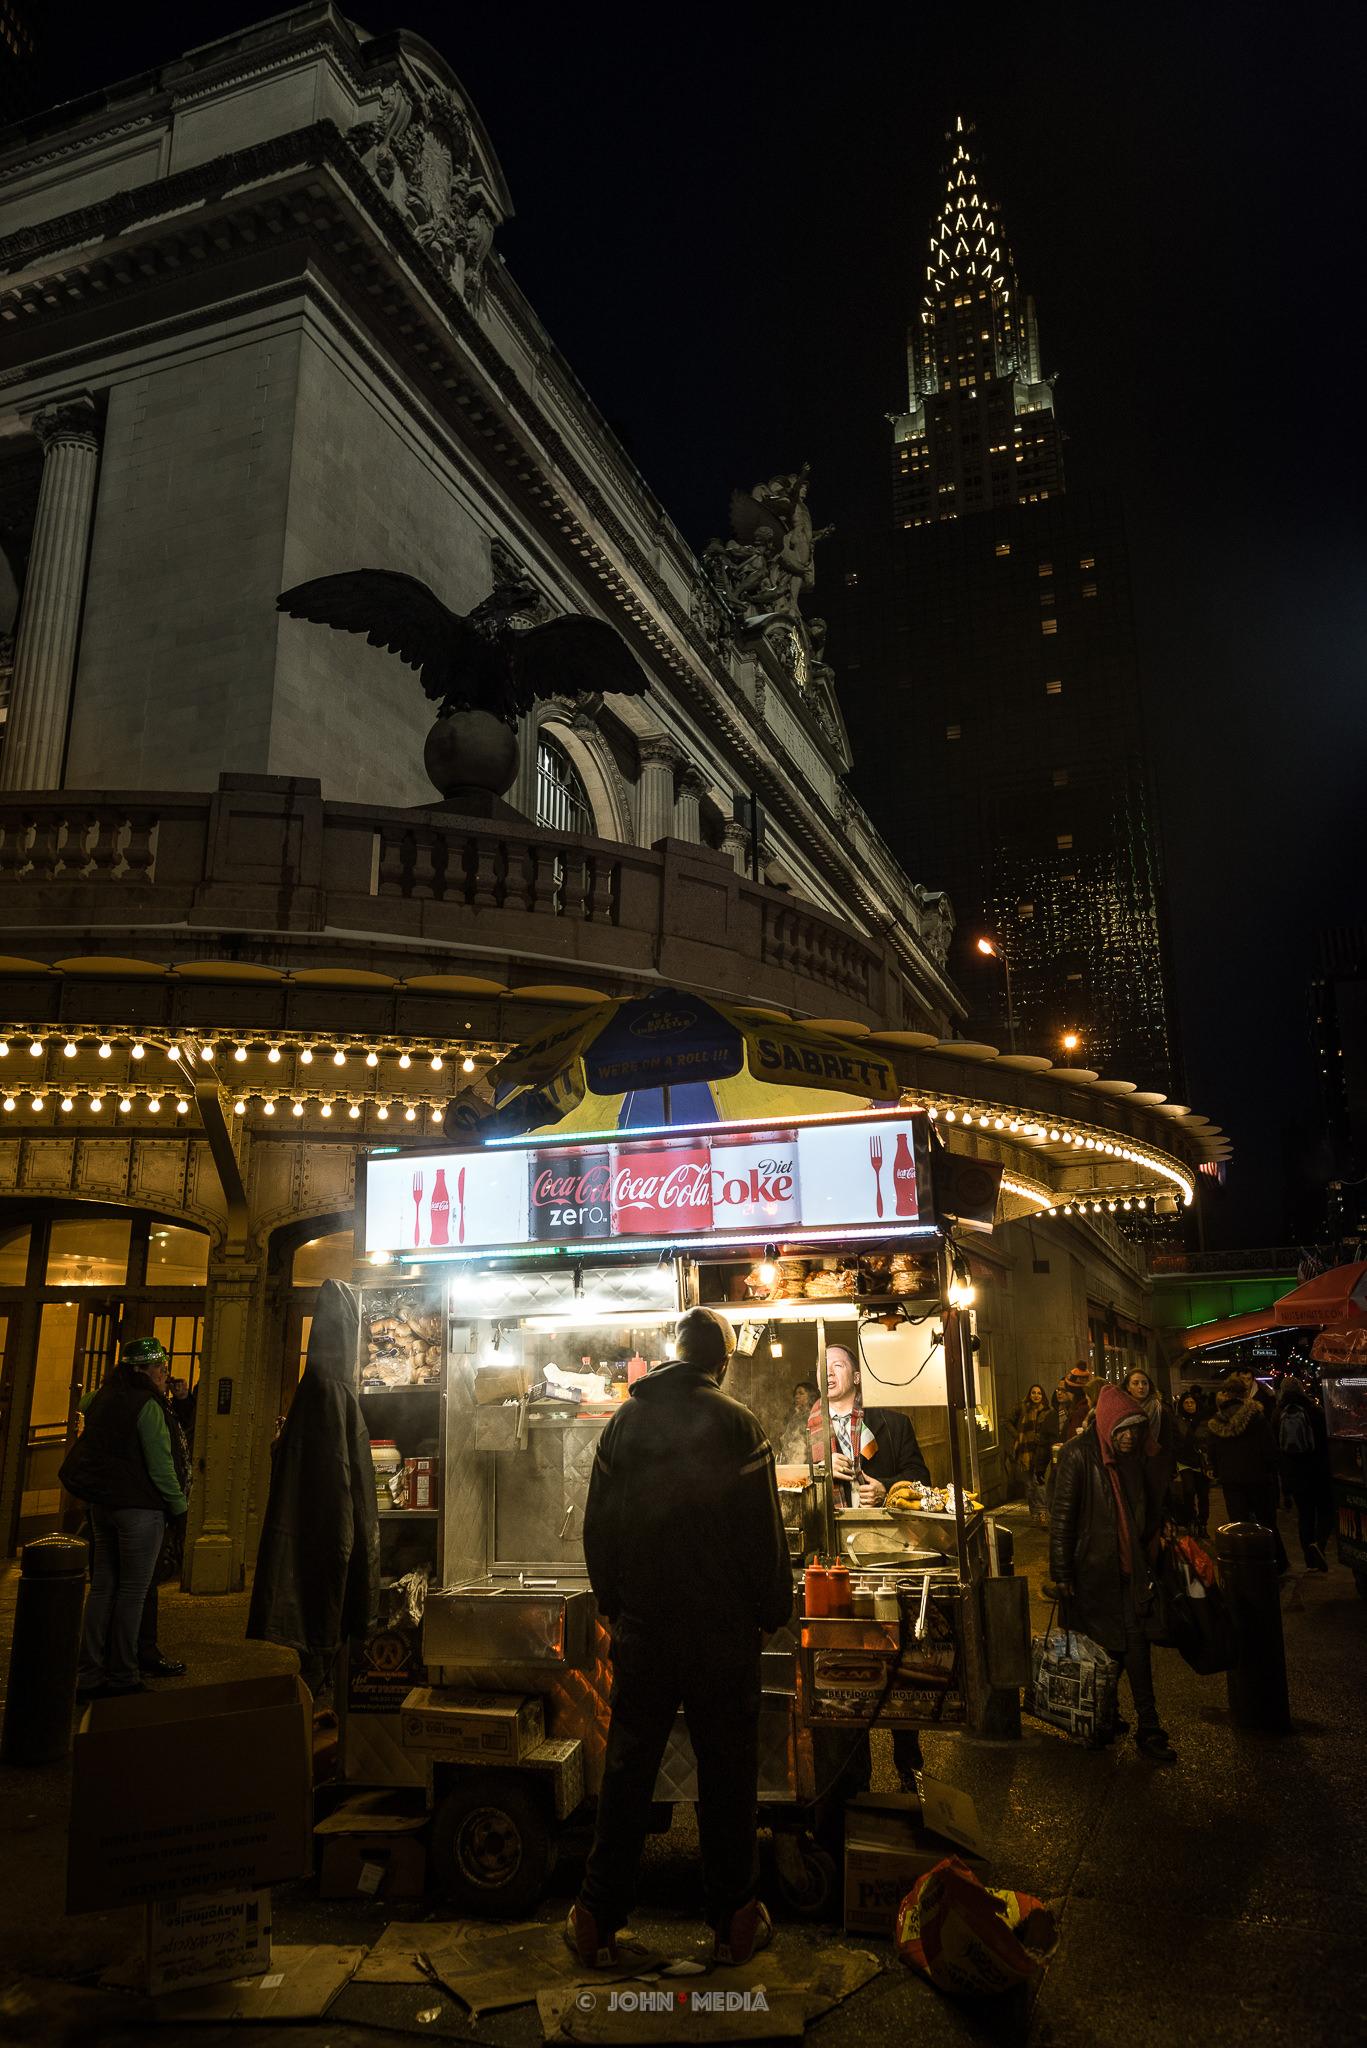 Grand Central Vendor